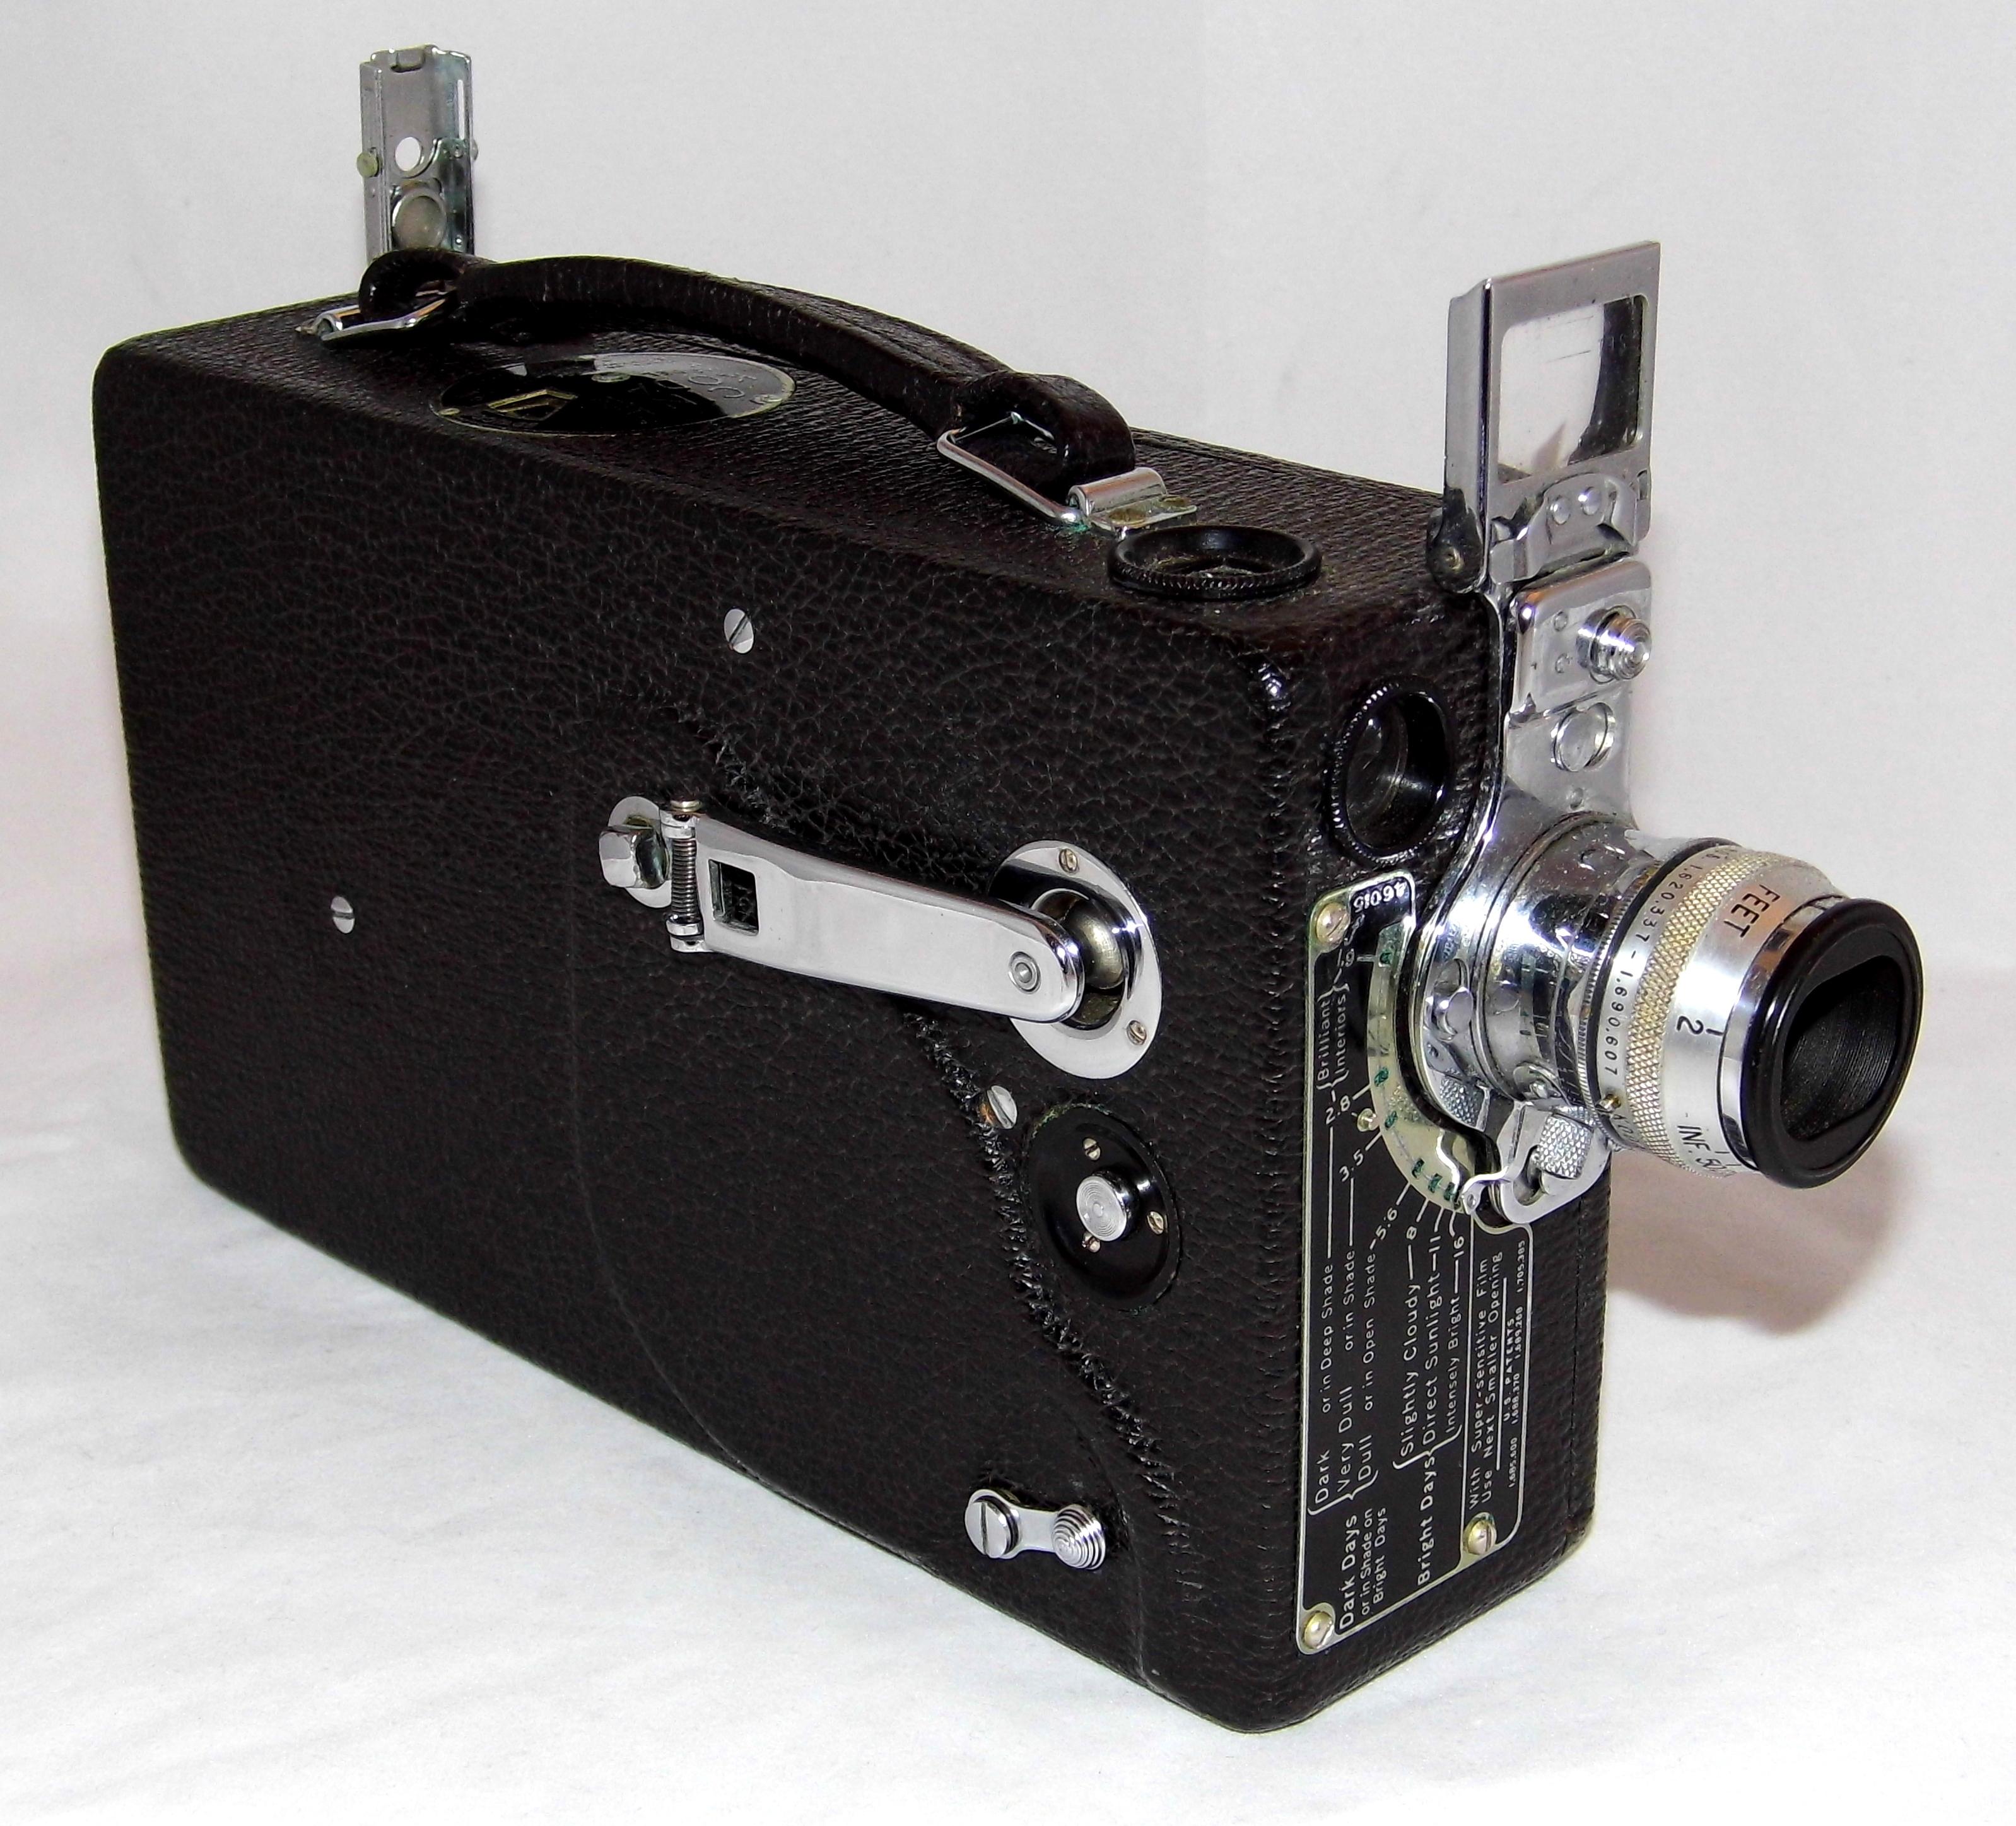 File:Vintage Cine-Kodak Model K 16mm Home Movie Camera, Made